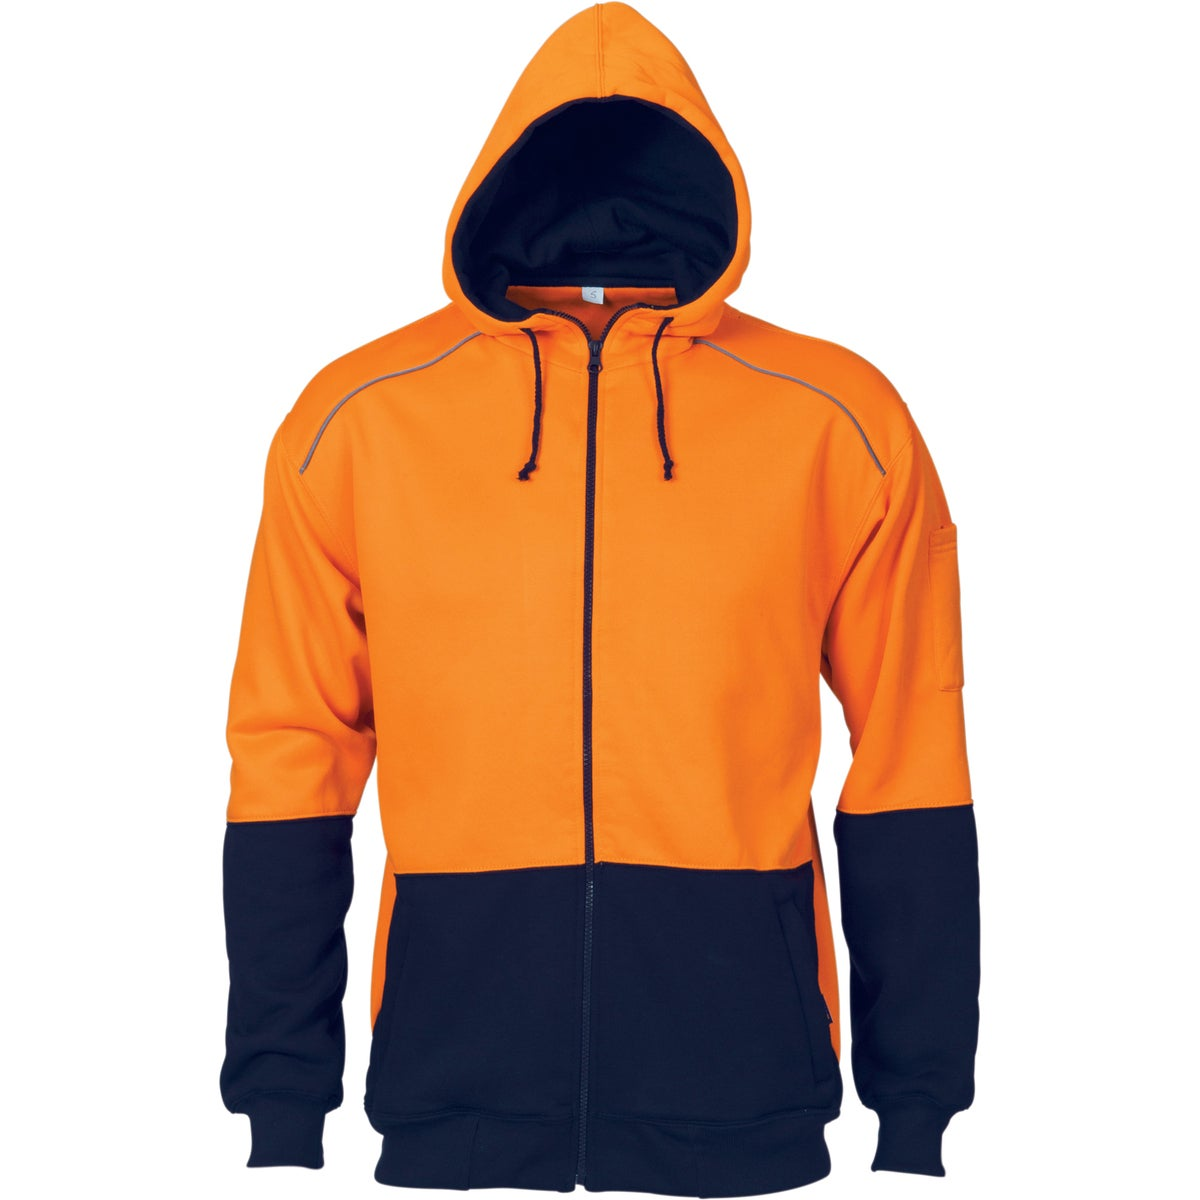 DNC HiVis Contrast Piping Fleecy Hoodie - Orange/Navy - 6XL